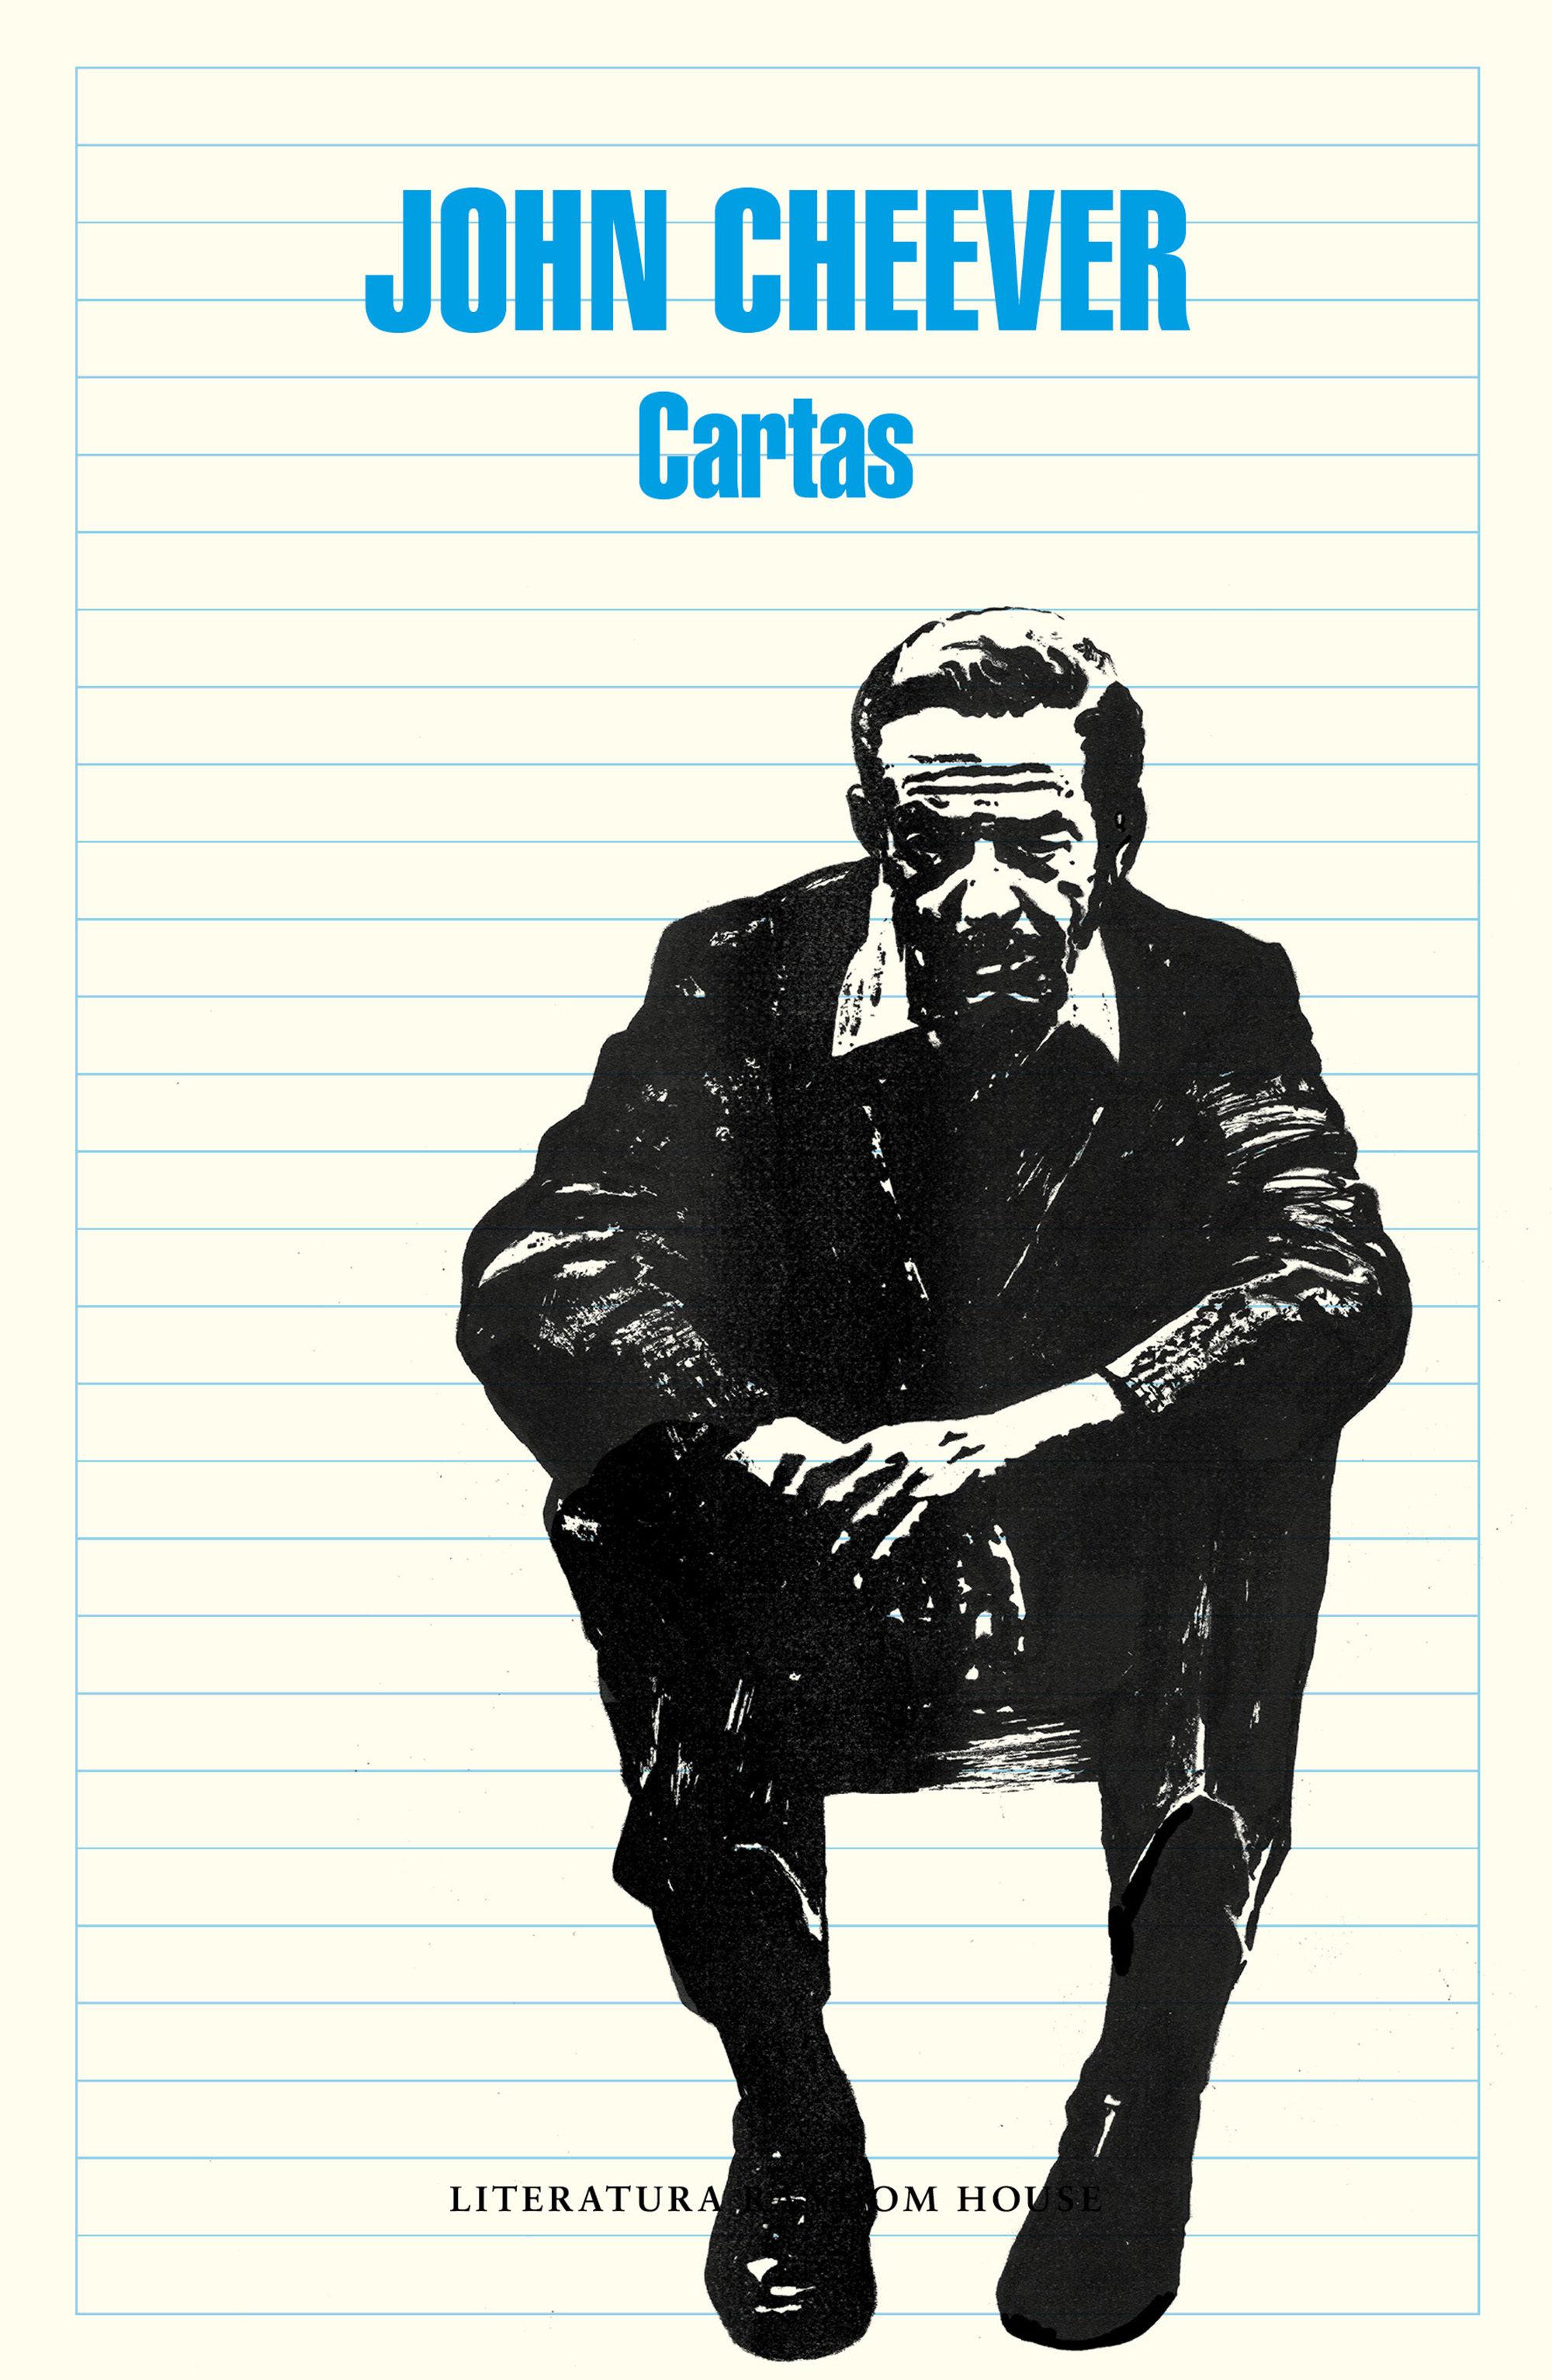 Cartas  - John Cheever - LITERATURA RANDOM HOUSE